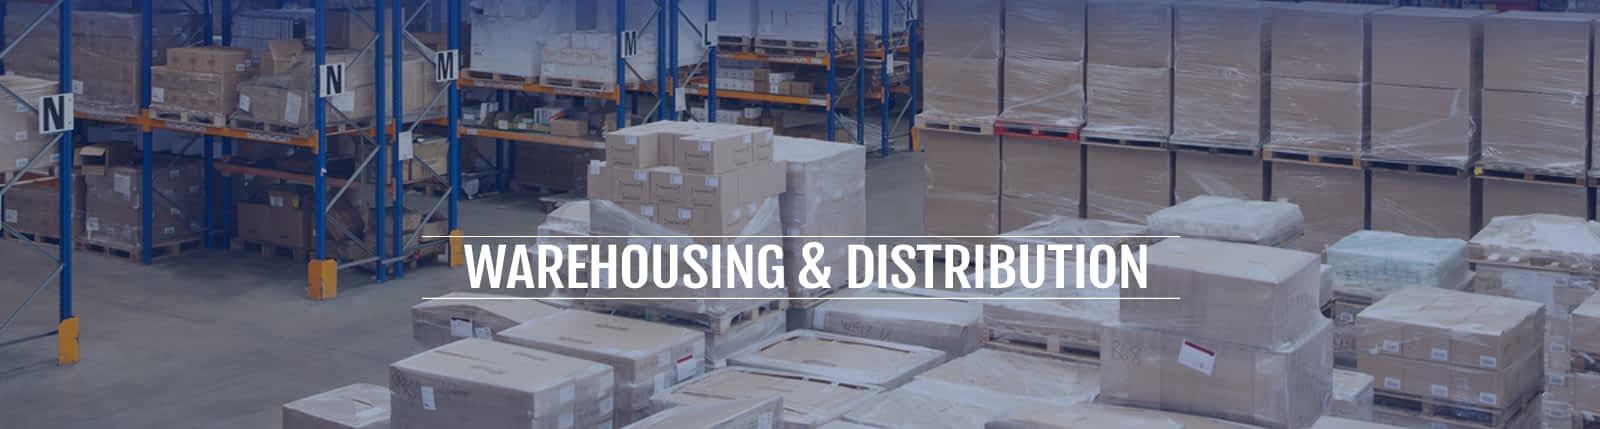 warehousing distribution banner